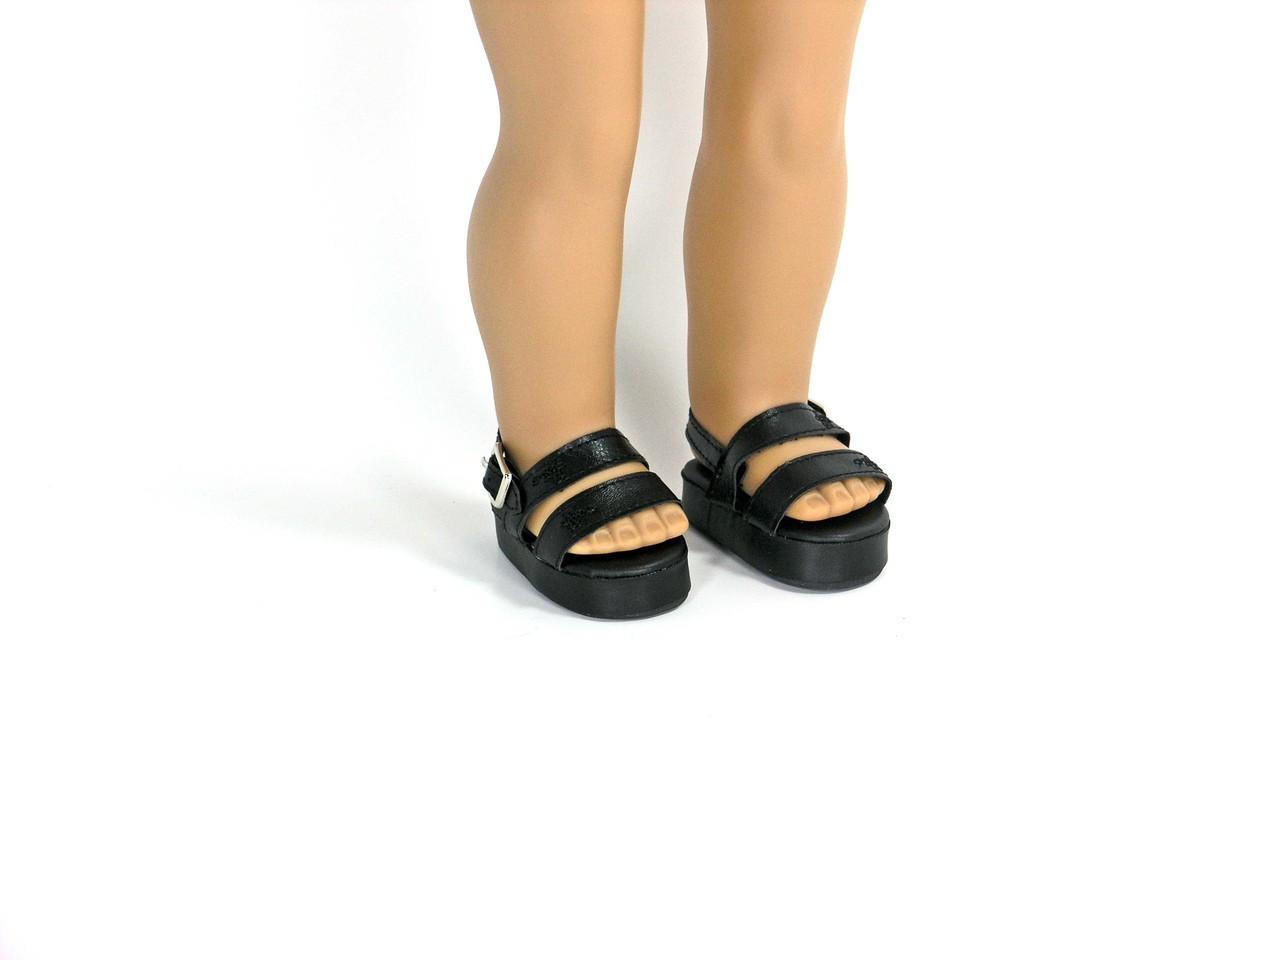 73718b3b4d6f4 Black Platform Sandals fit 18 inch American Girl, Madame Alexander Dolls